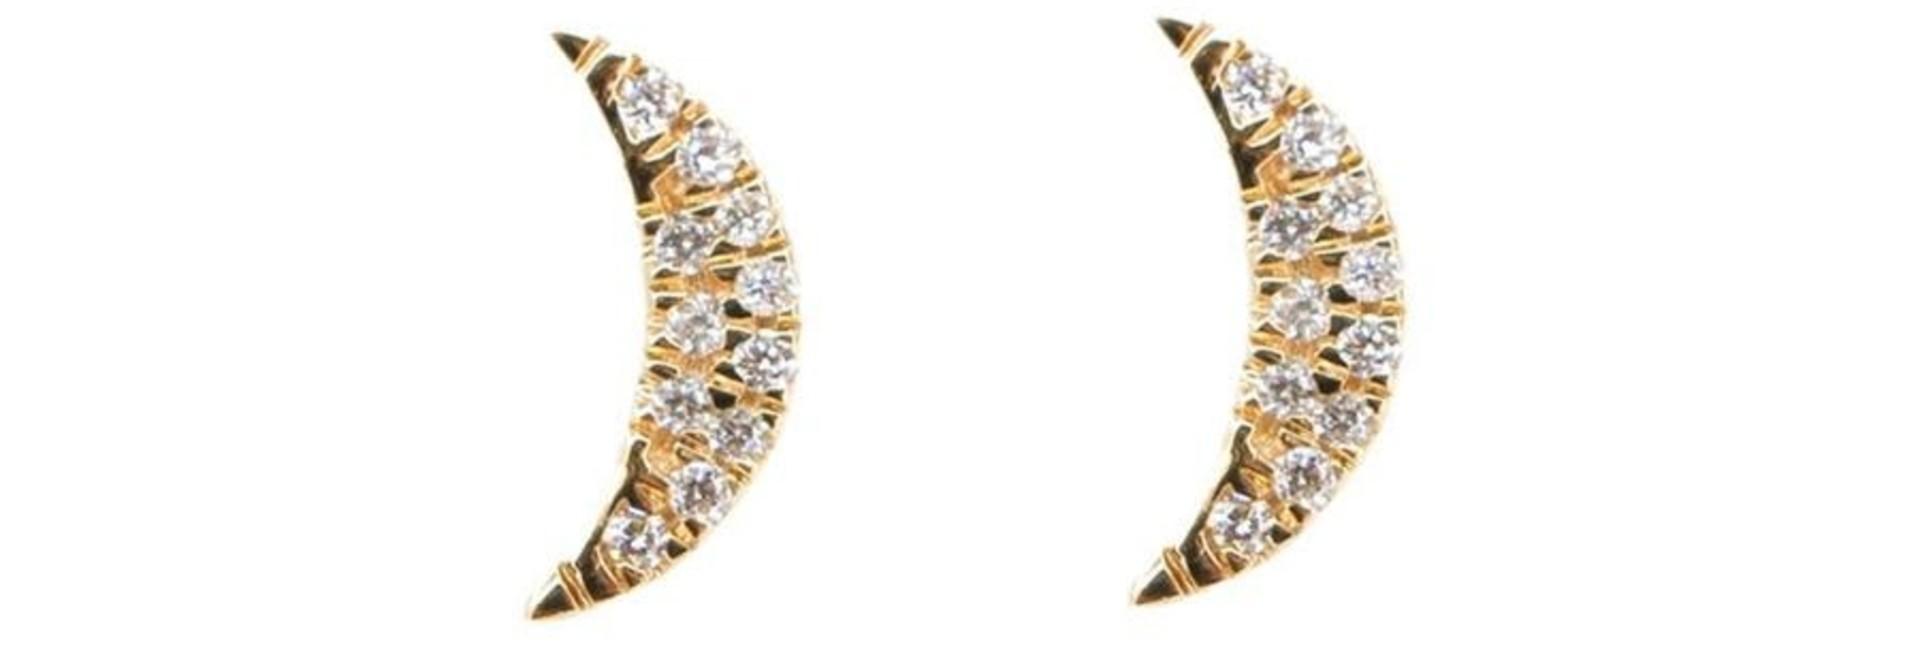 MMJ 14 KT YELLOW GOLD DIAMOND MINI MOON EARRINGS